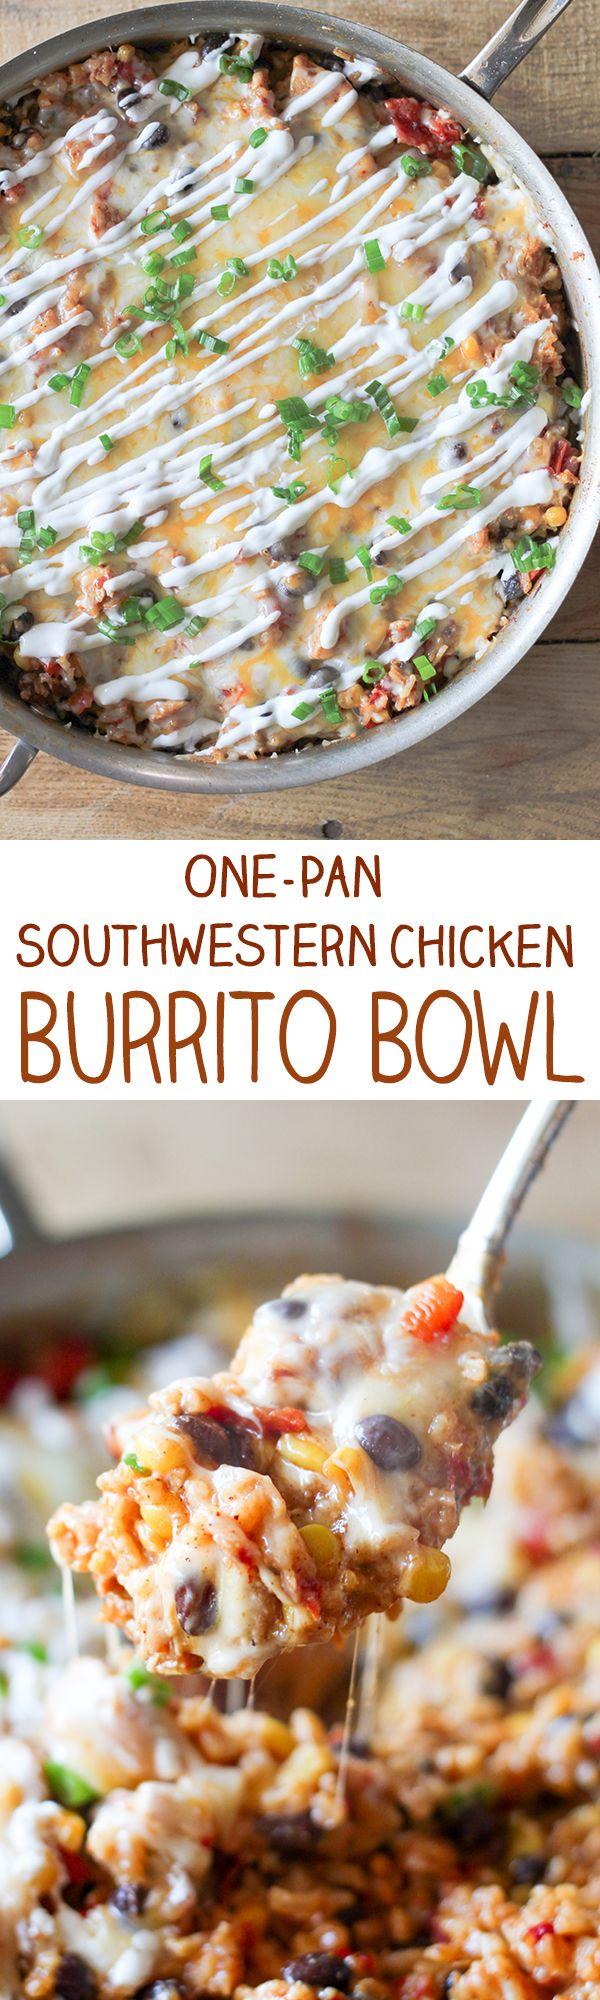 One-Pan Southwestern Chicken Burrito Bowl